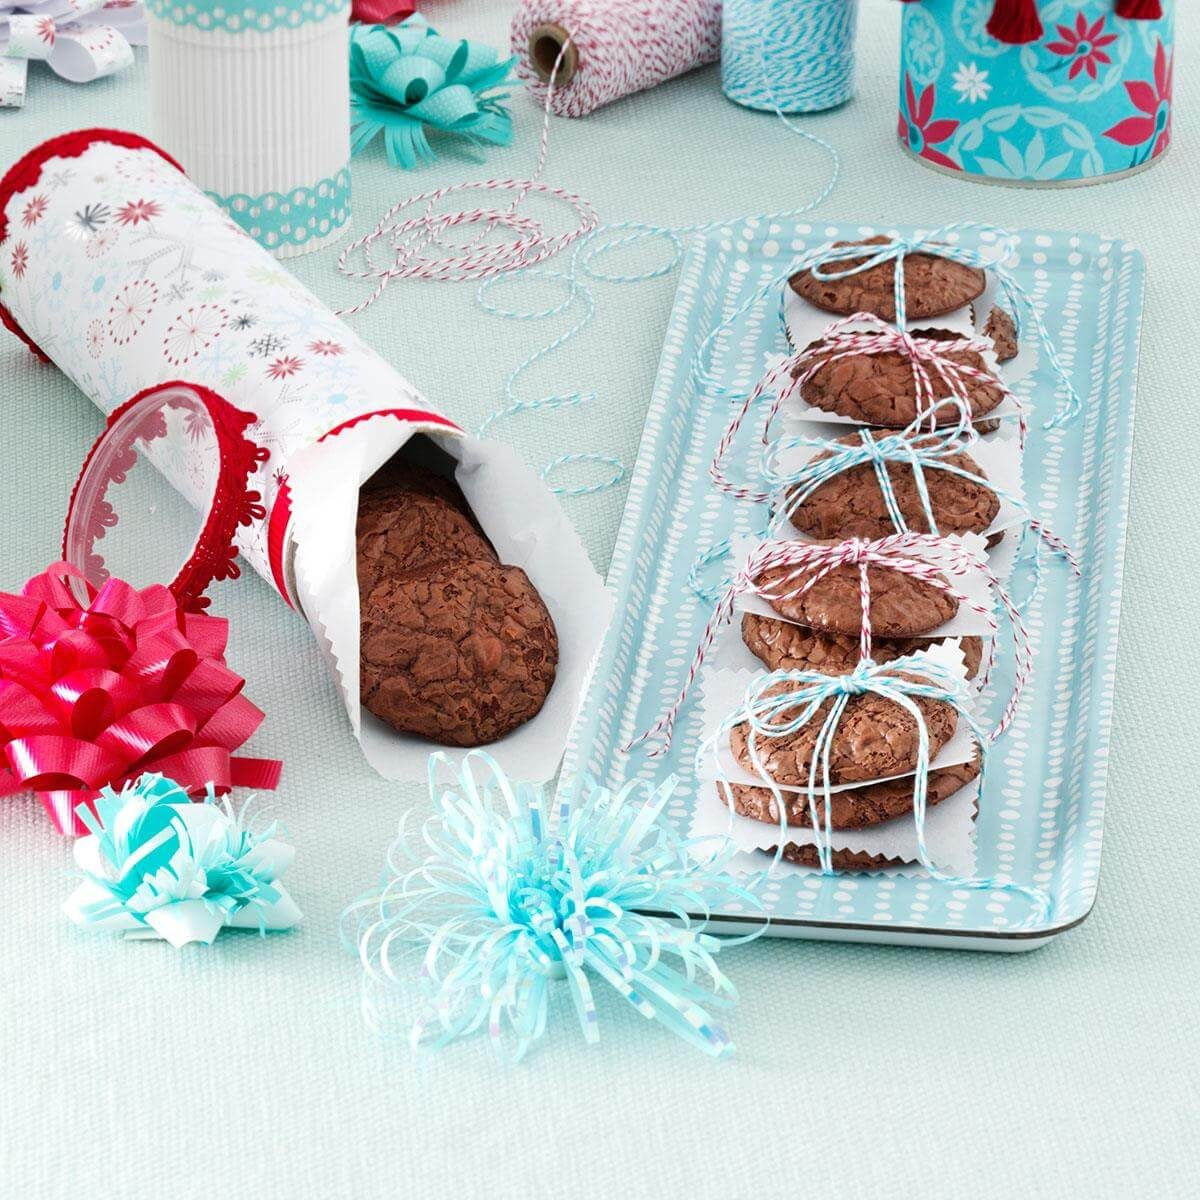 Gingered Molasses Cookies Recipe | Taste of Home